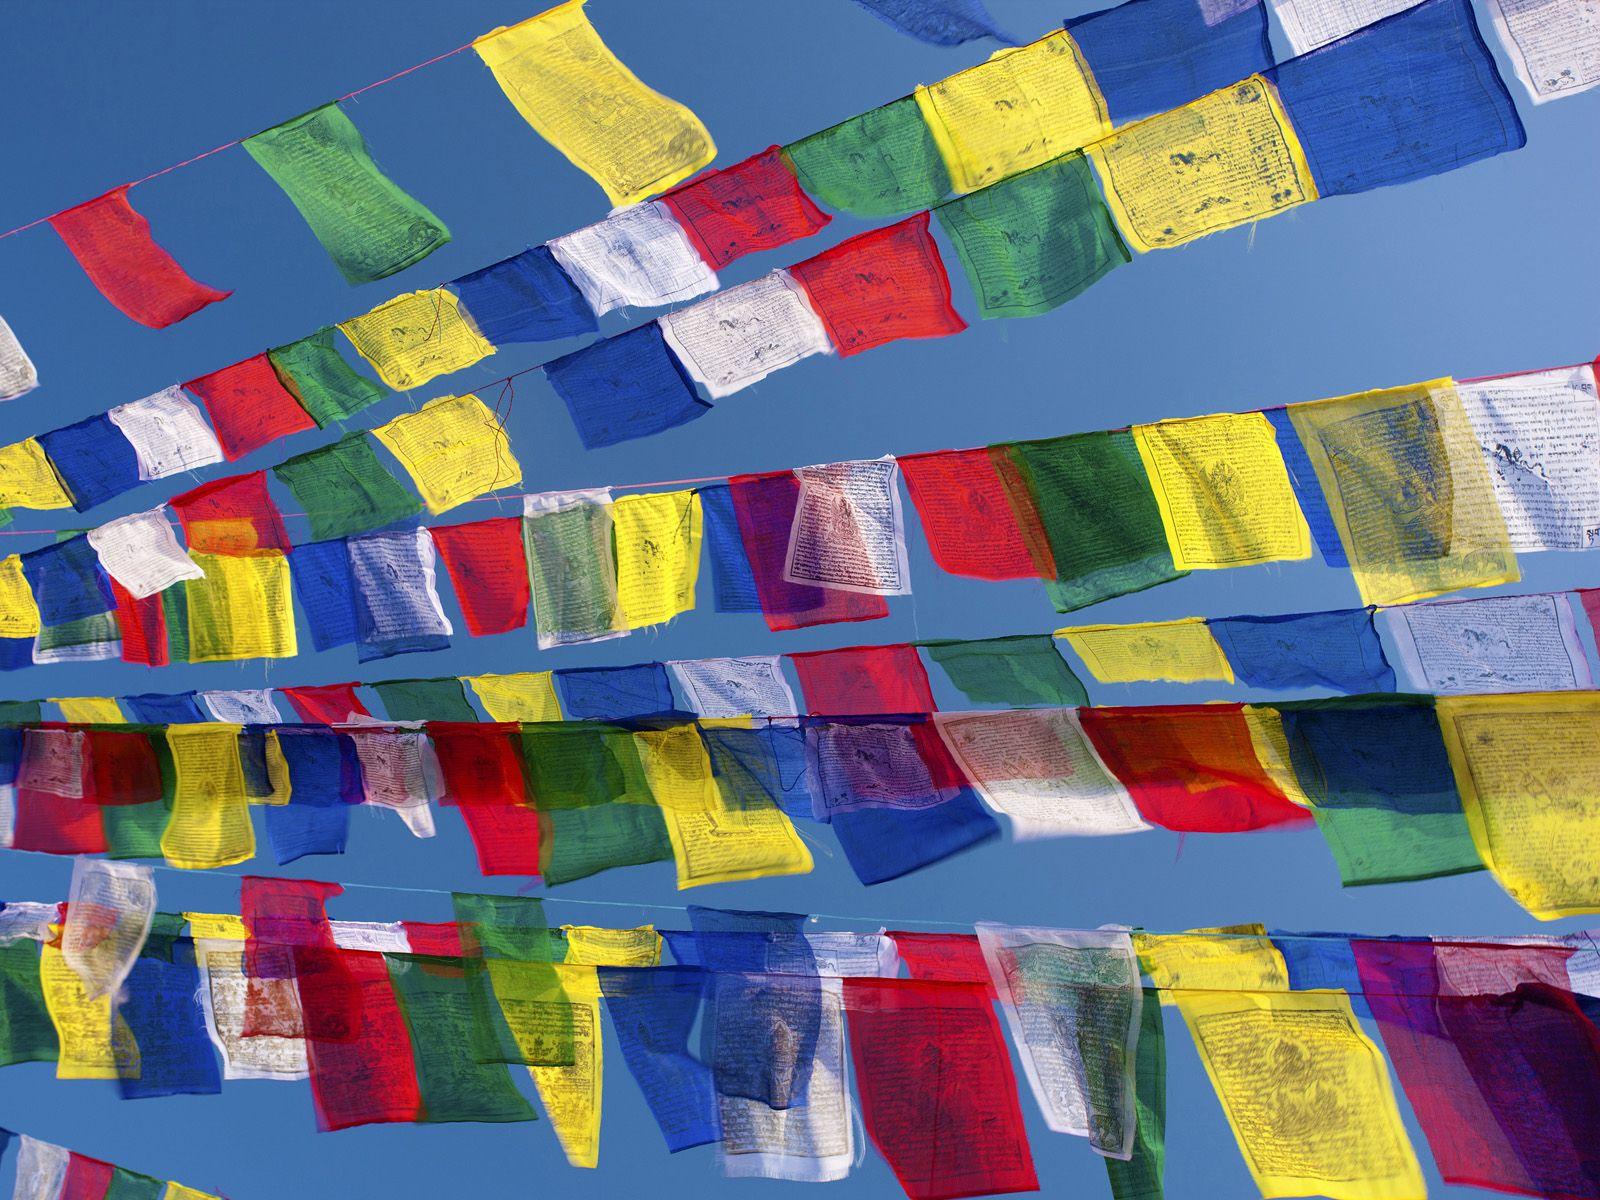 Sheer Wrap - Tibetan Prayer Flags by VIDA VIDA YUJHC